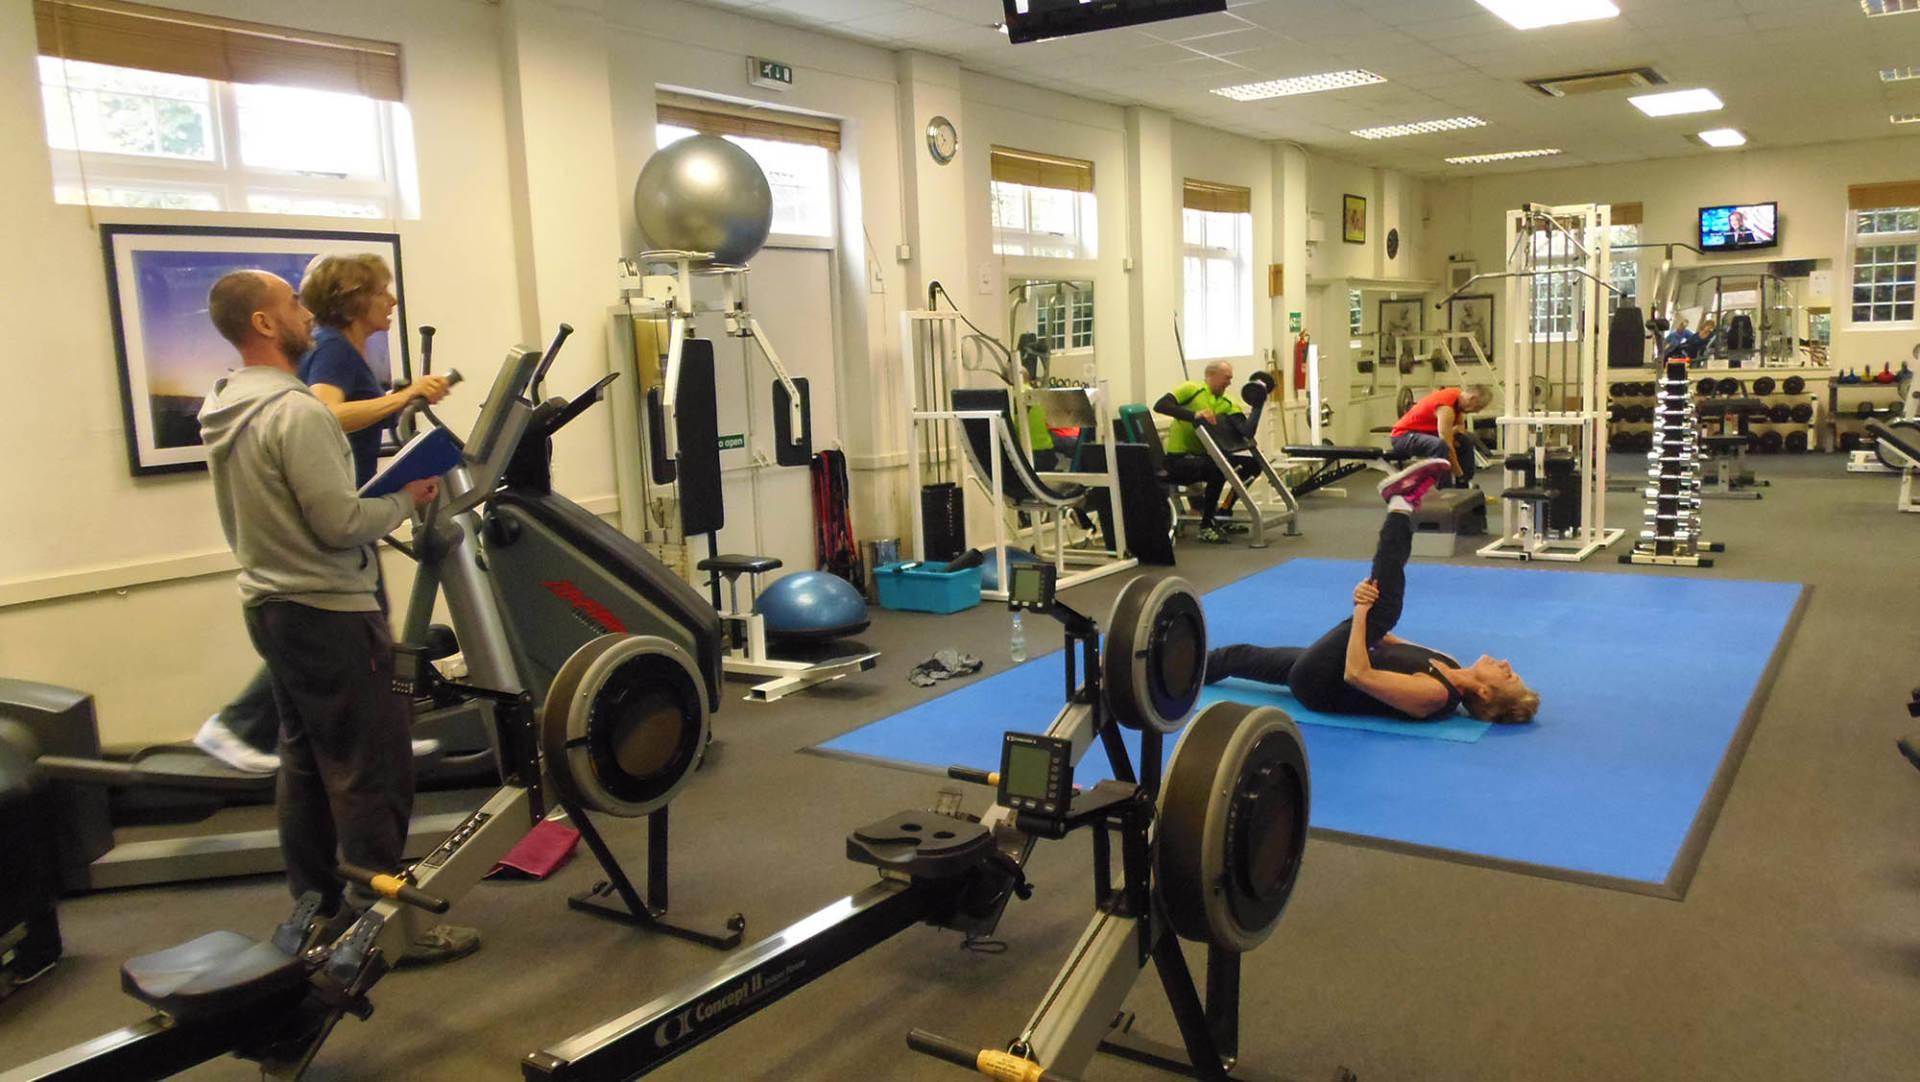 Superb-modern-fitness-studio.-1